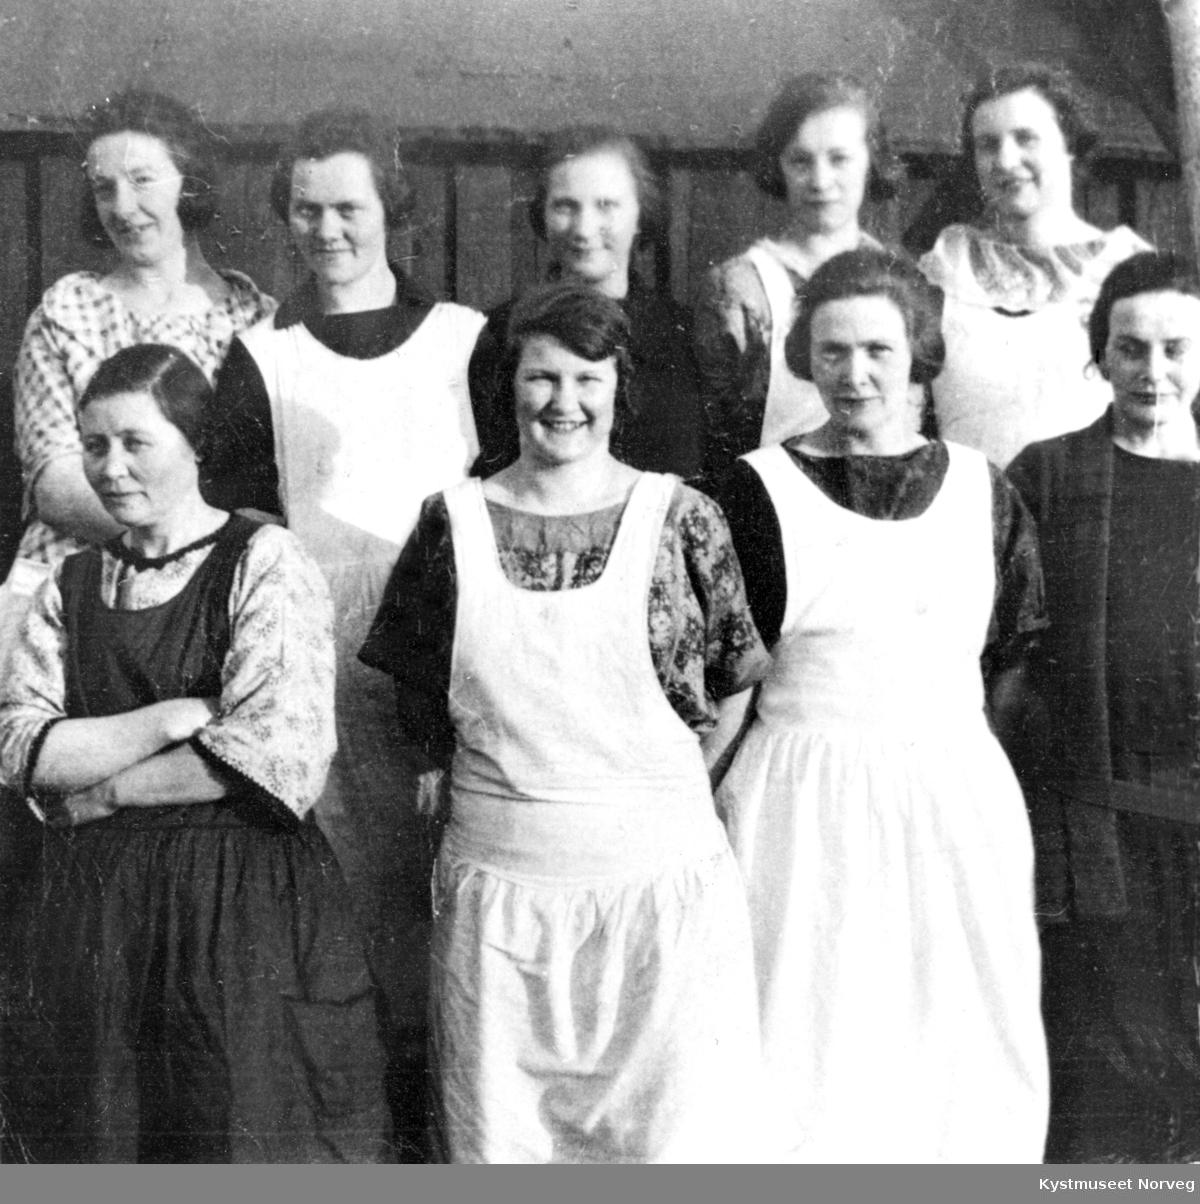 1. rekke fra venstre: Lise Sæternes, Lena Hasfjord, Sofie Sylten, Alfhild Vikestad. 2. rekke fra venstre: Margit Hunnestad, Johanna Grindvik Kvalø, Dagny Lyngsnes, Kitty Kvalø og Hulda Hasfjord, rorbukokker i Nordøyan